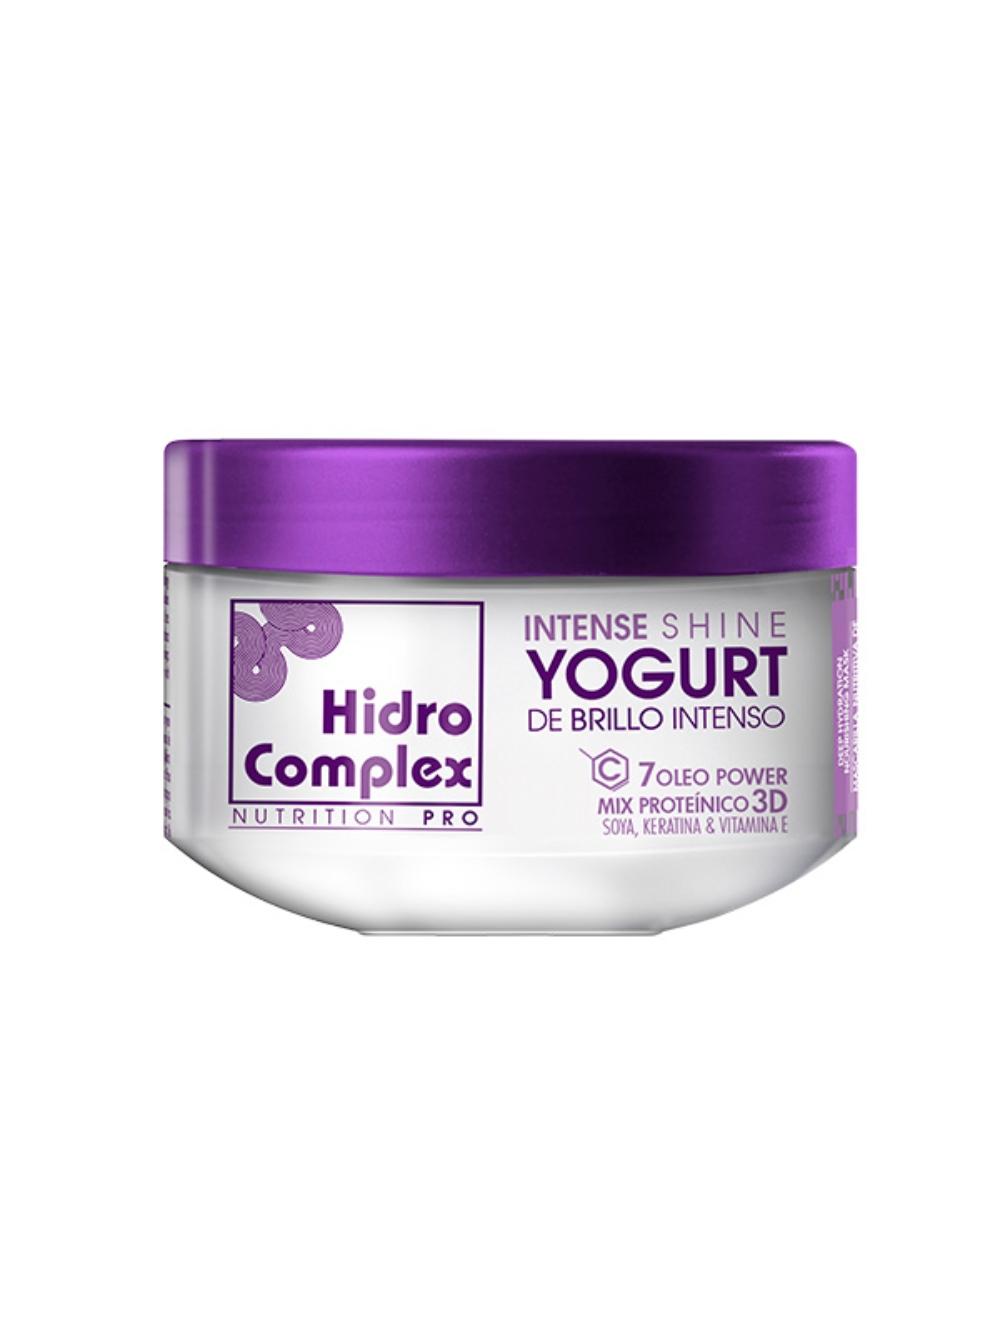 HidroComplex Intense Shine Yogurt Byspro